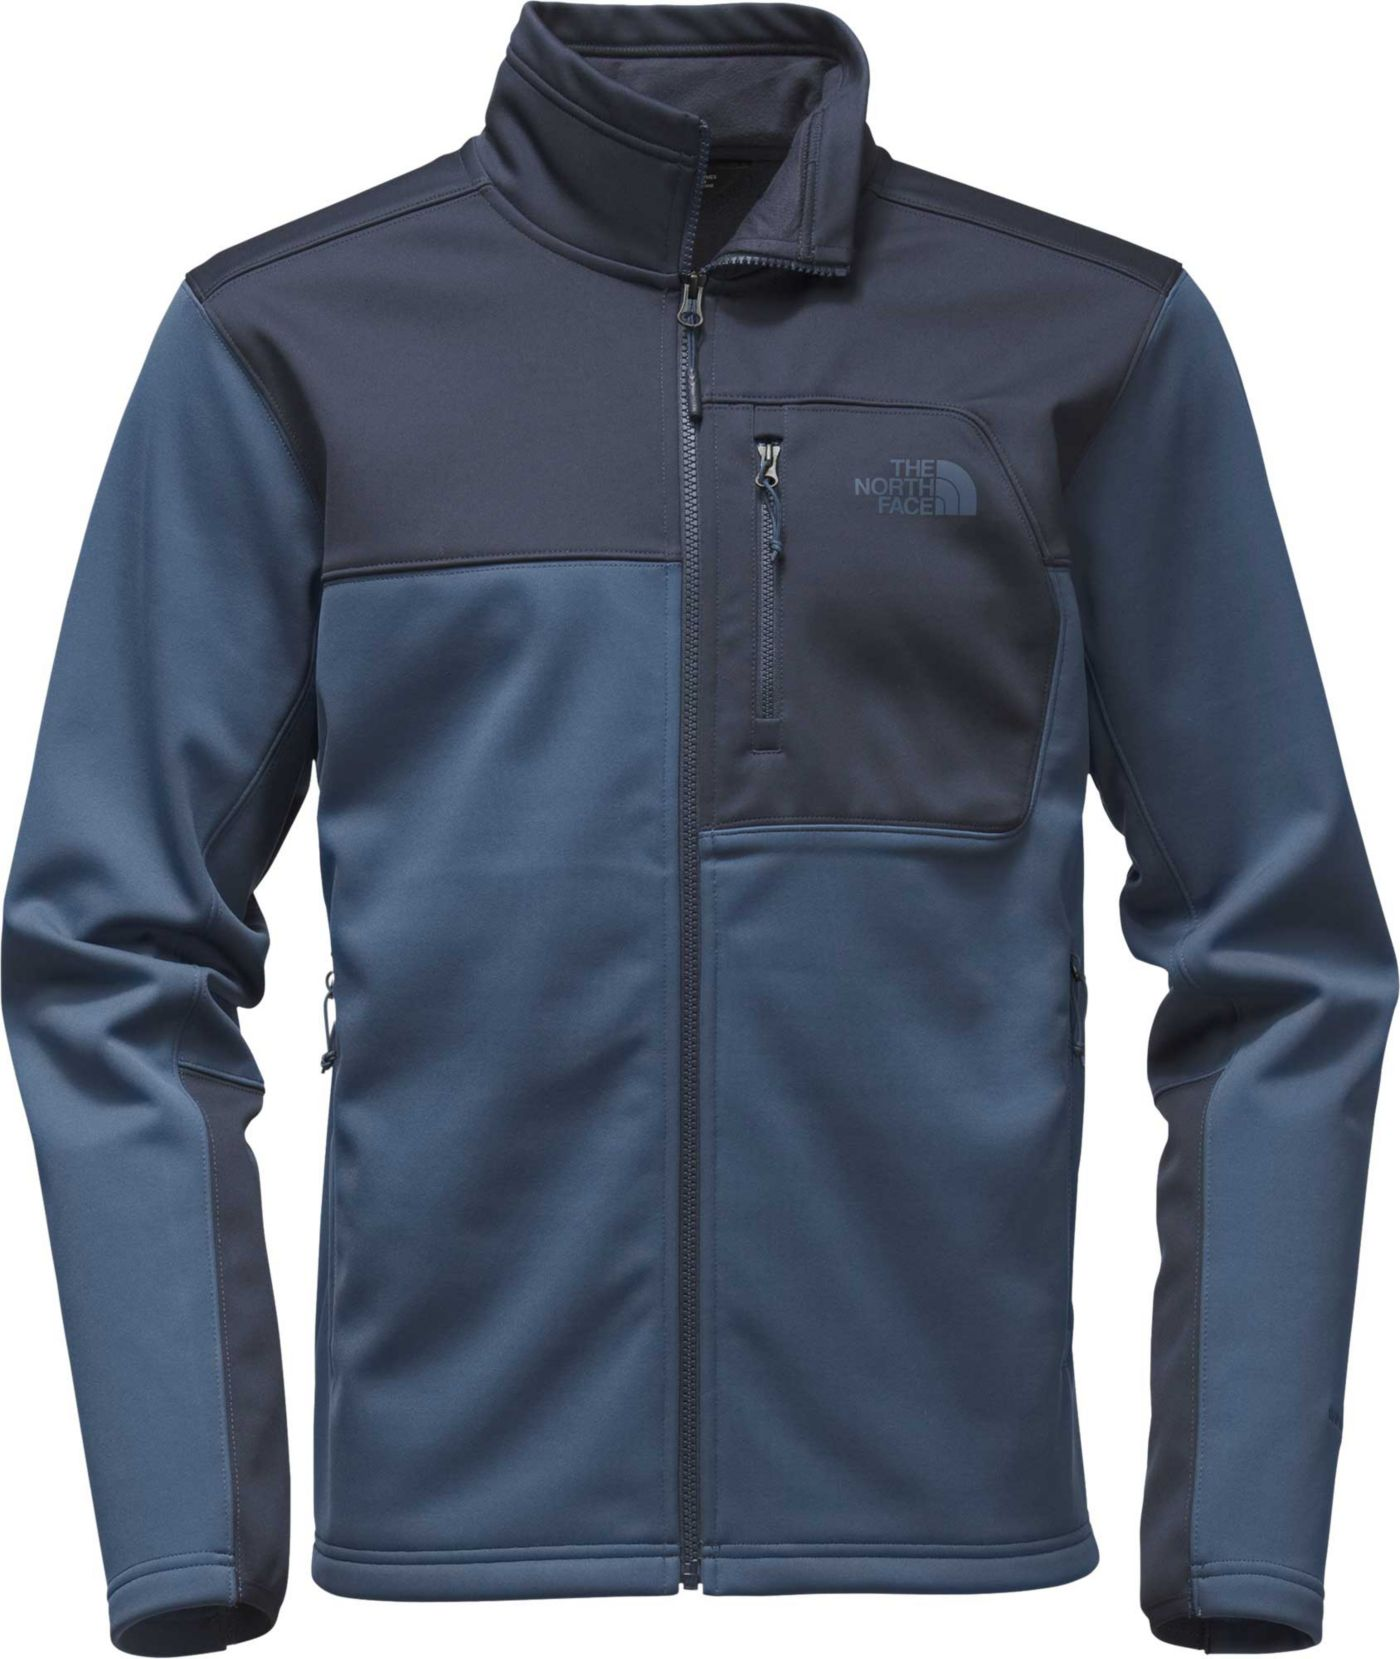 The North Face Men's Apex Risor Full Zip Jacket